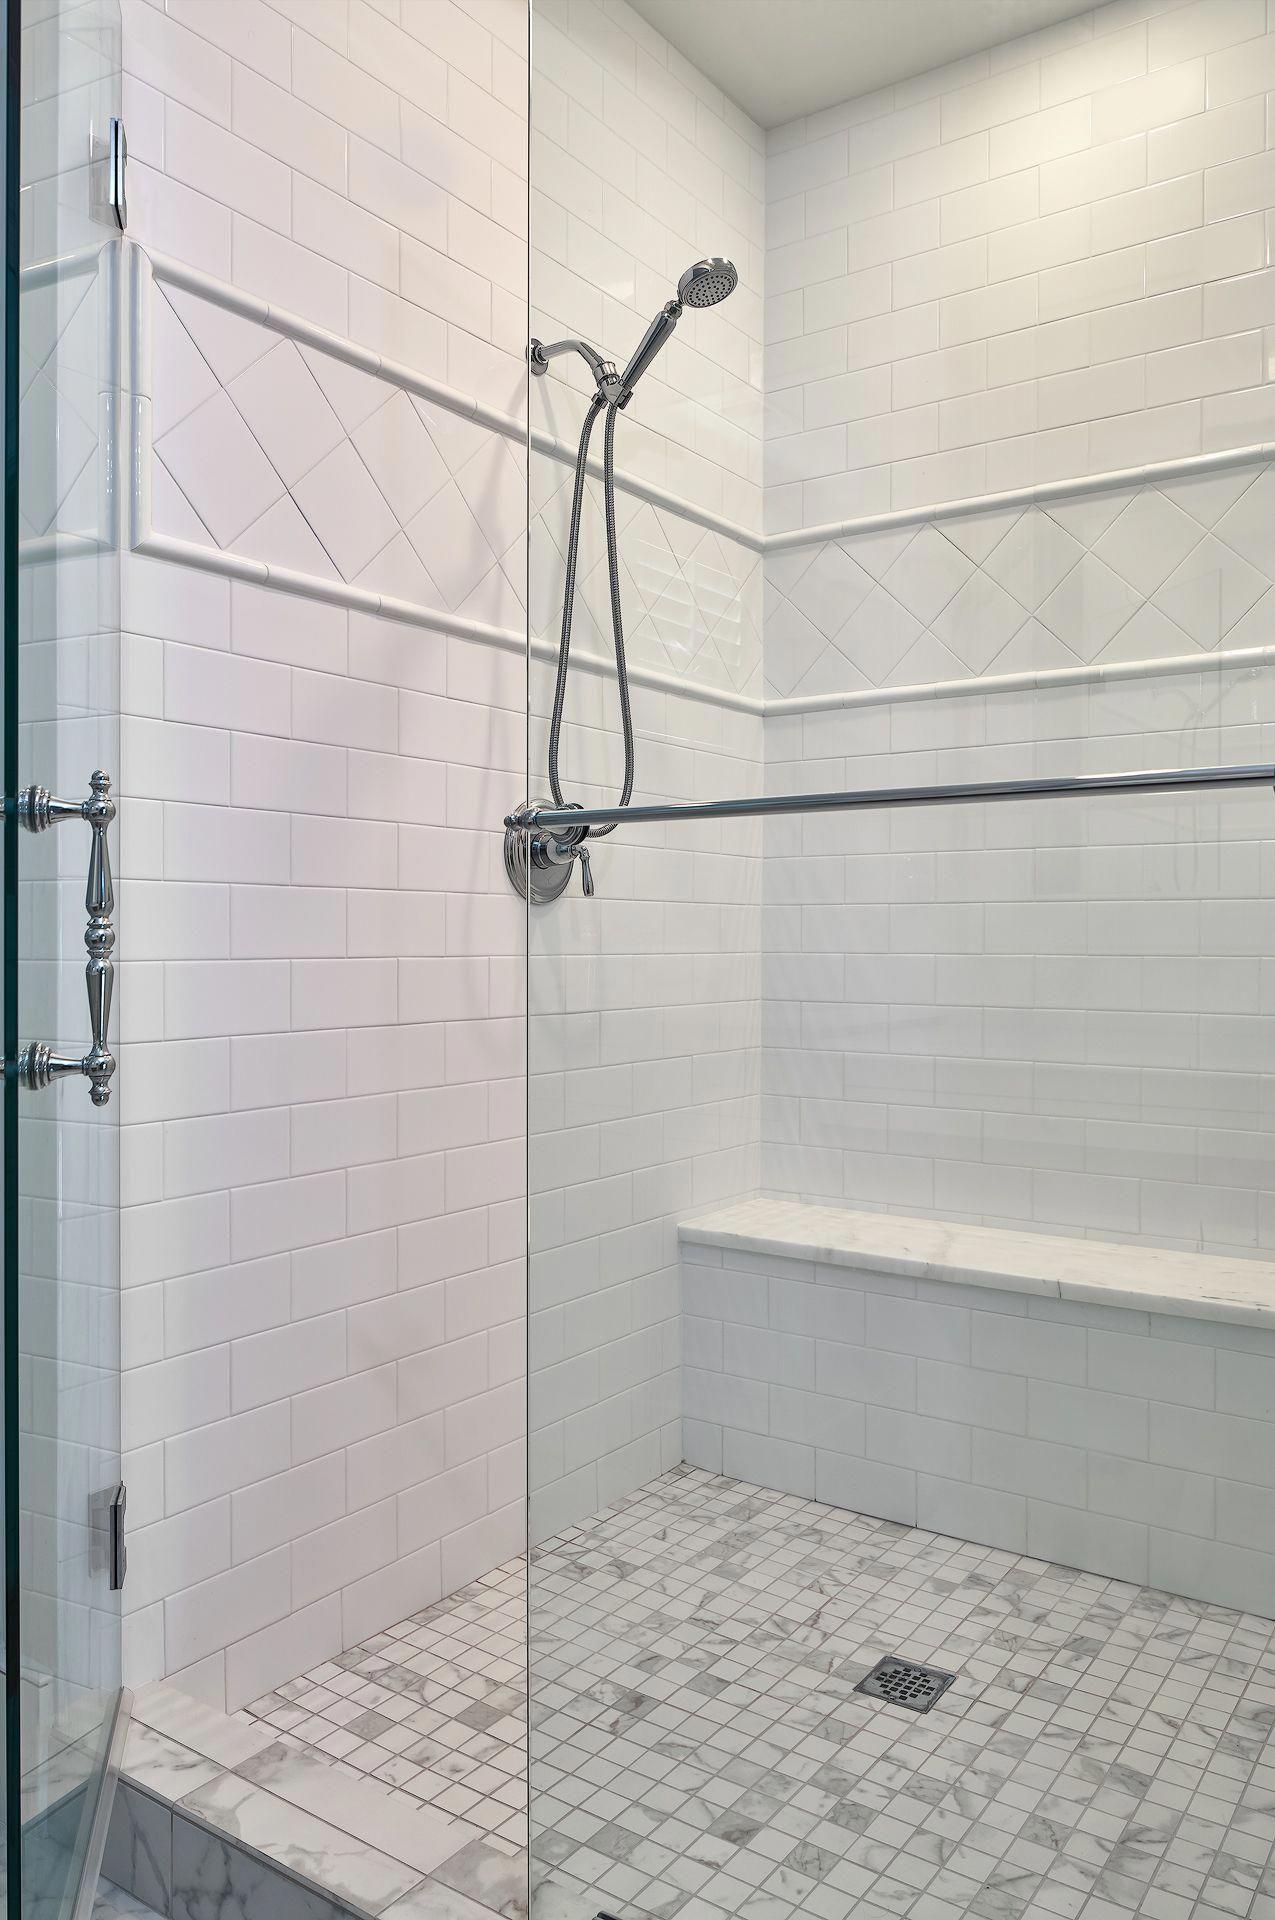 walkin shower in the junior master bathroom is stunning